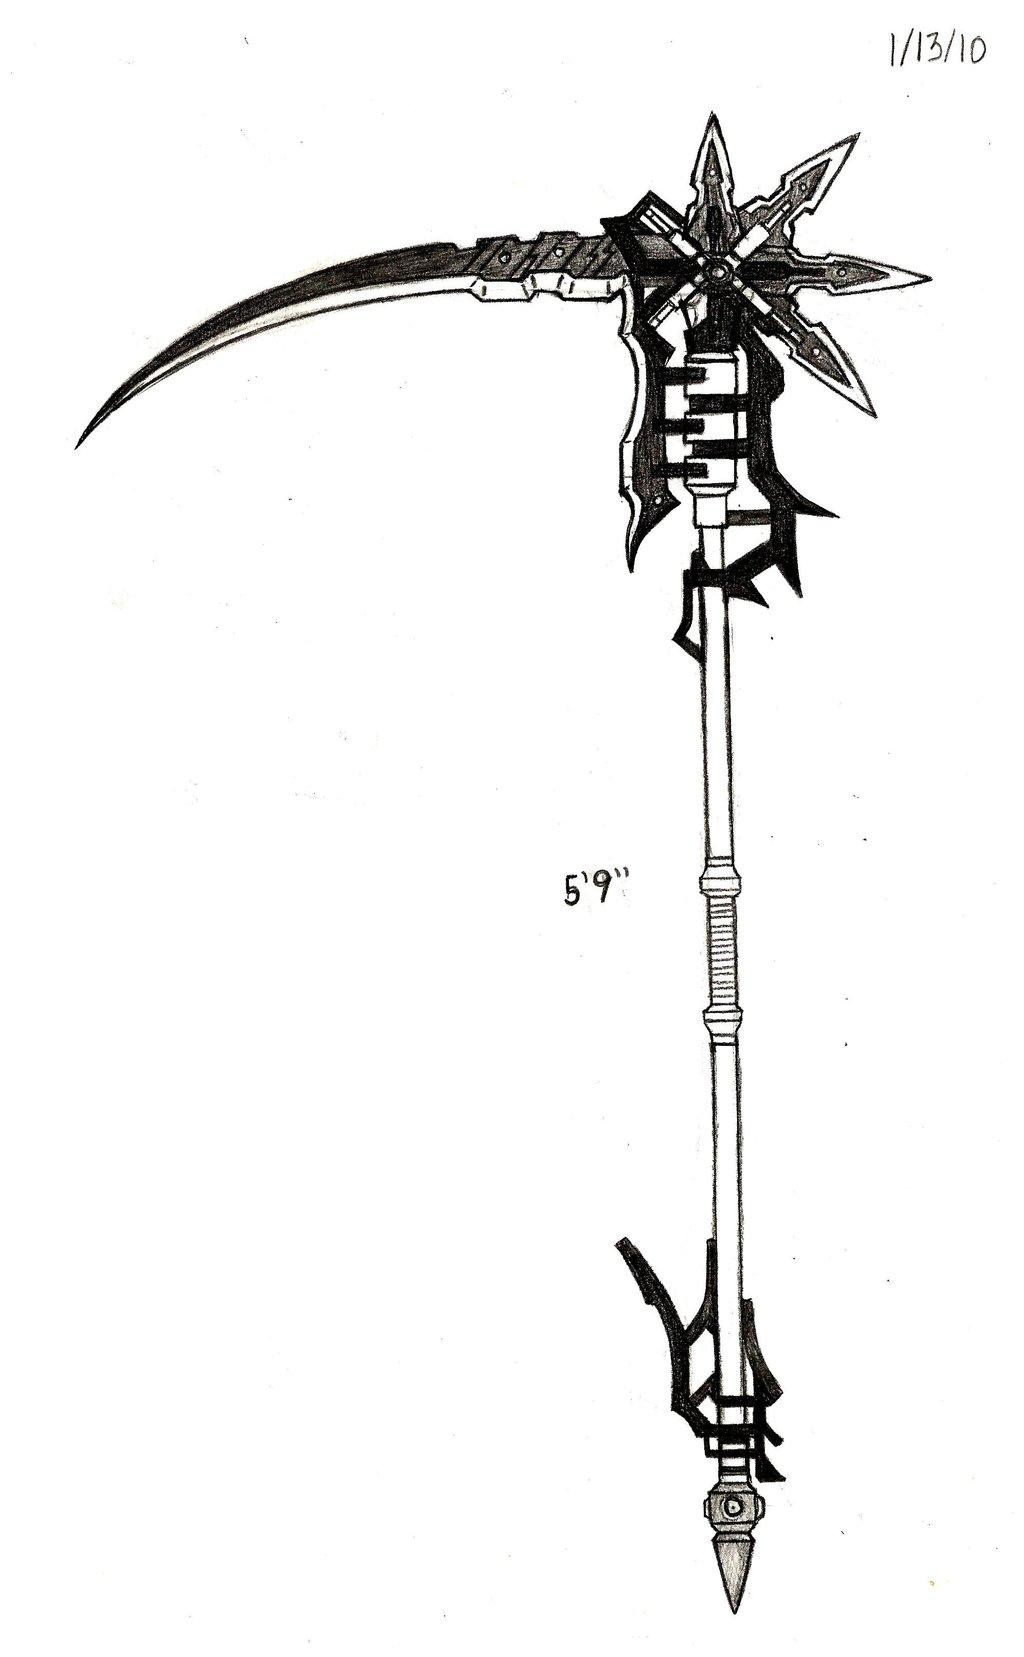 Drawn scythe tribal View flamestar1315 topic Scythe Chicken